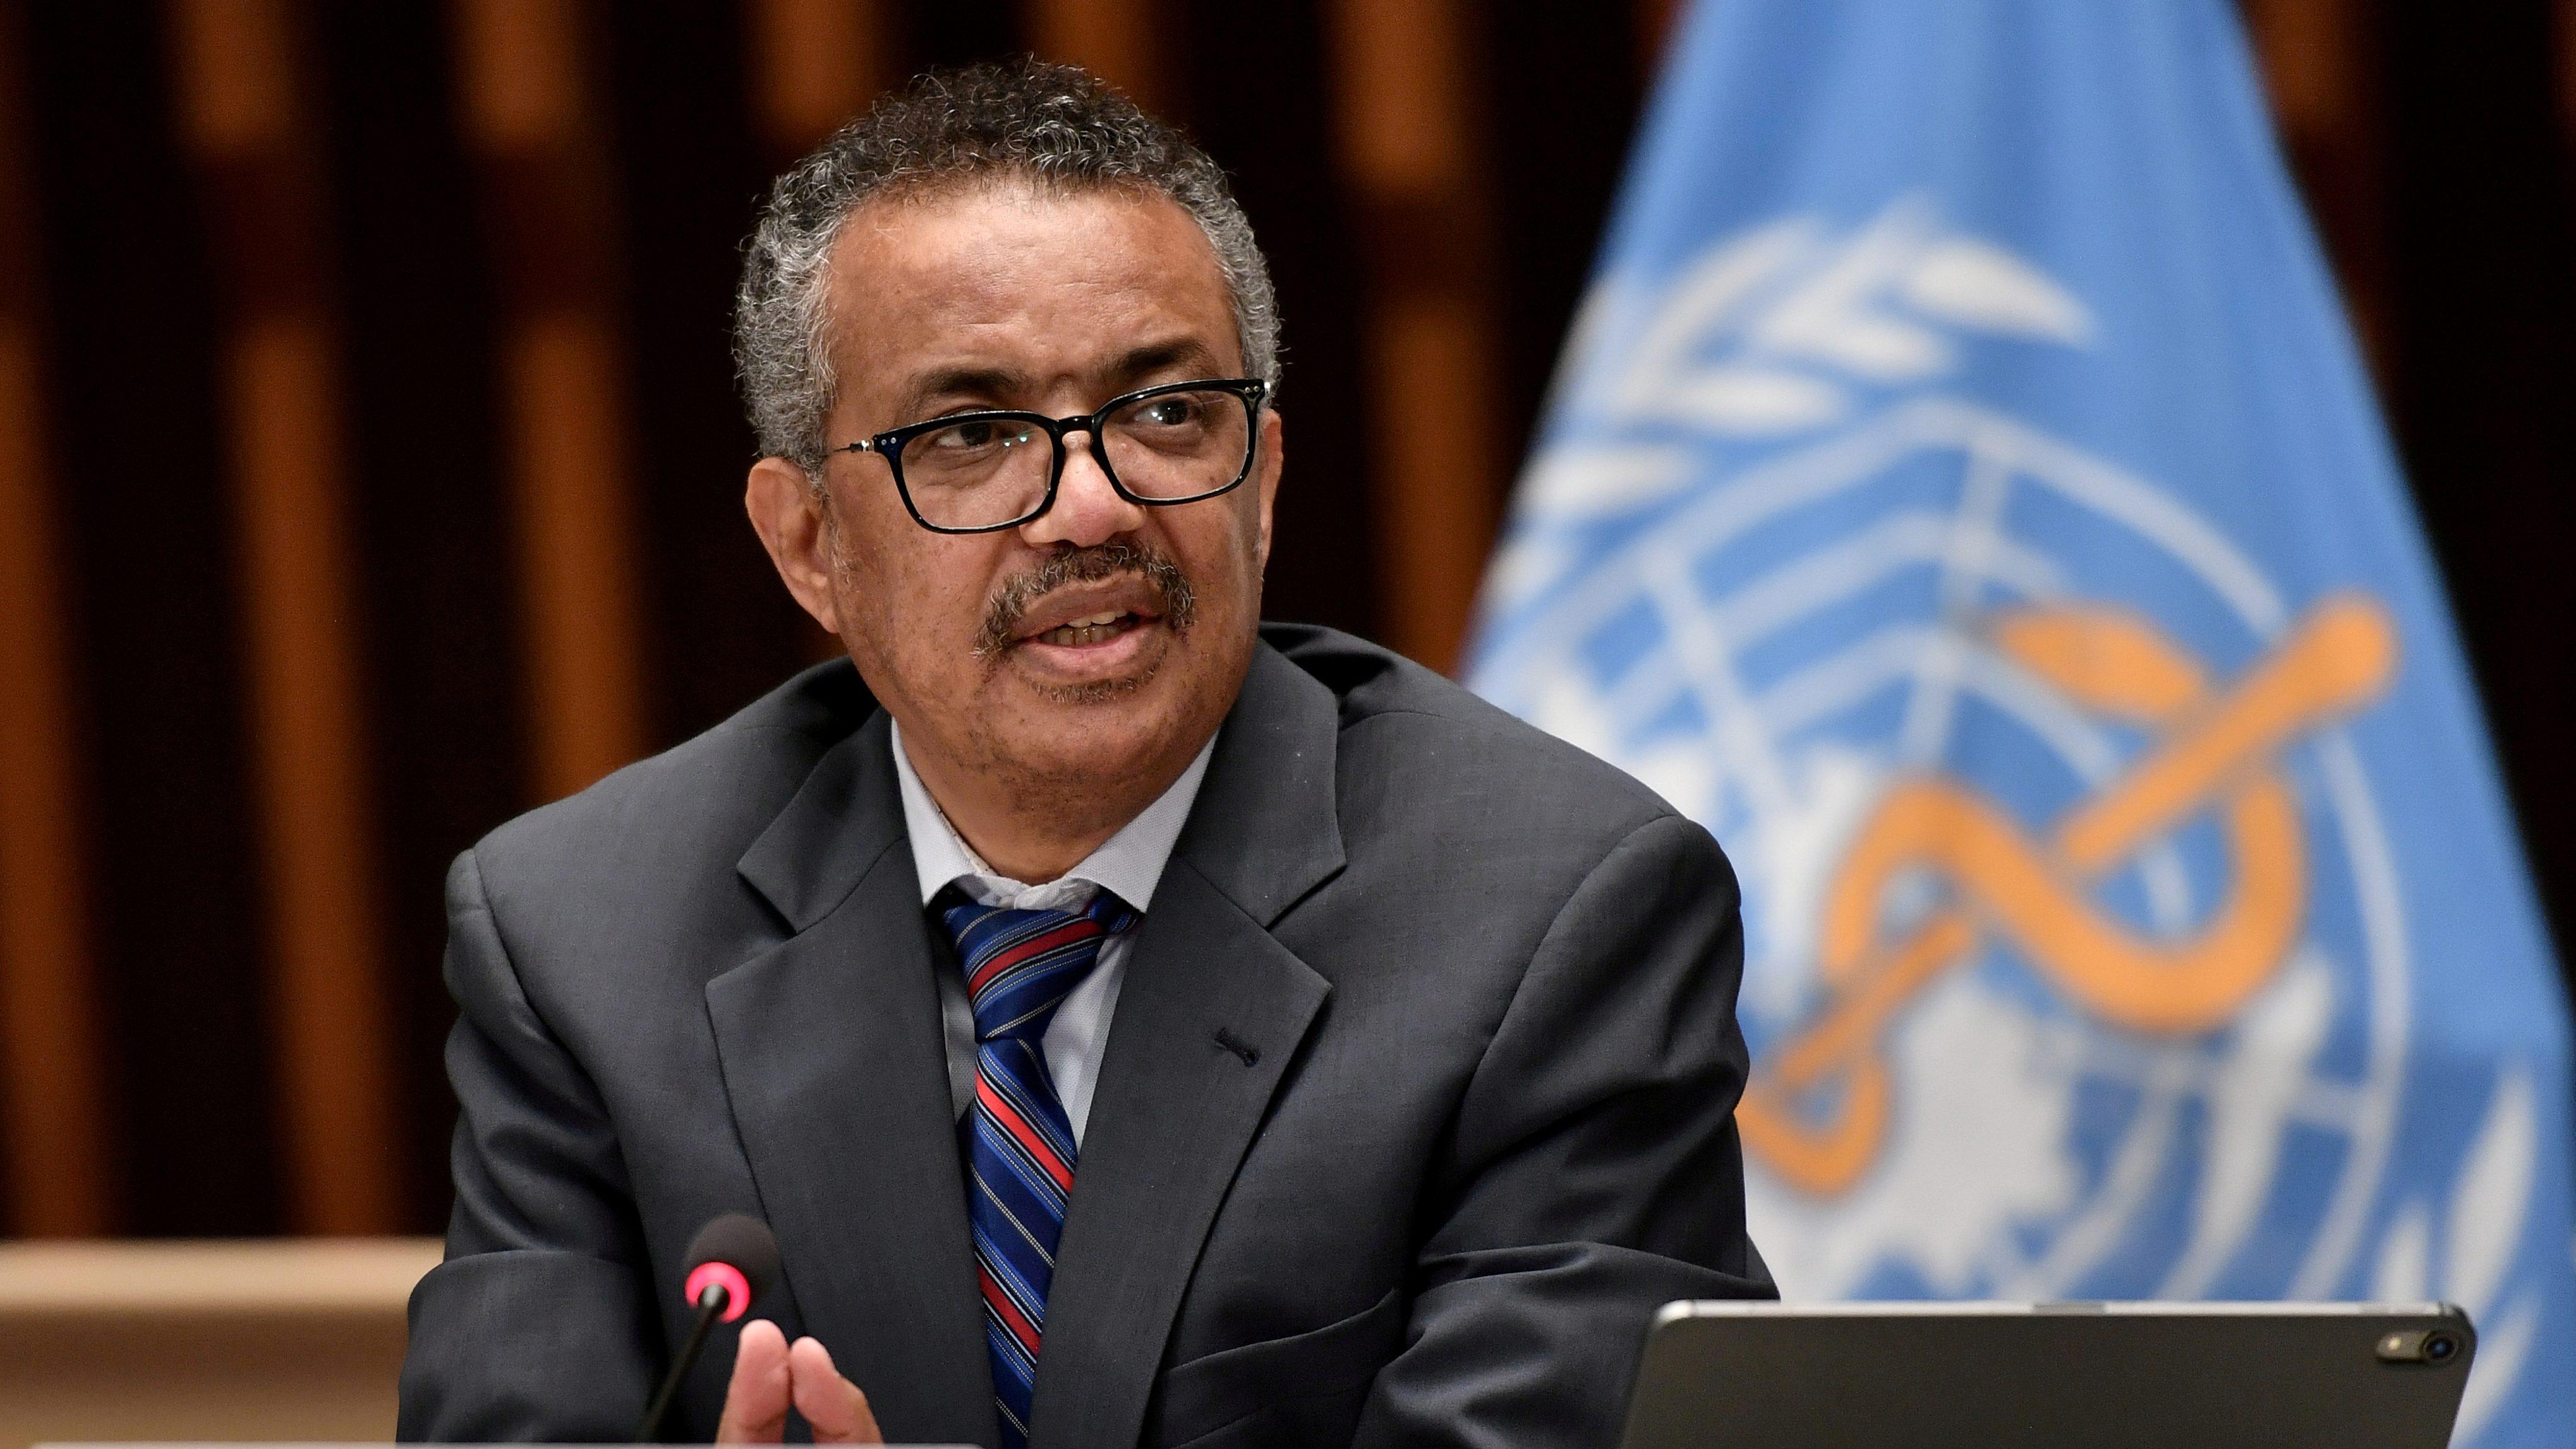 World Health Organization (WHO) Director-General Tedros Adhanom Ghebreyesus attends a news conference in Geneva Switzerland July 3, 2020.